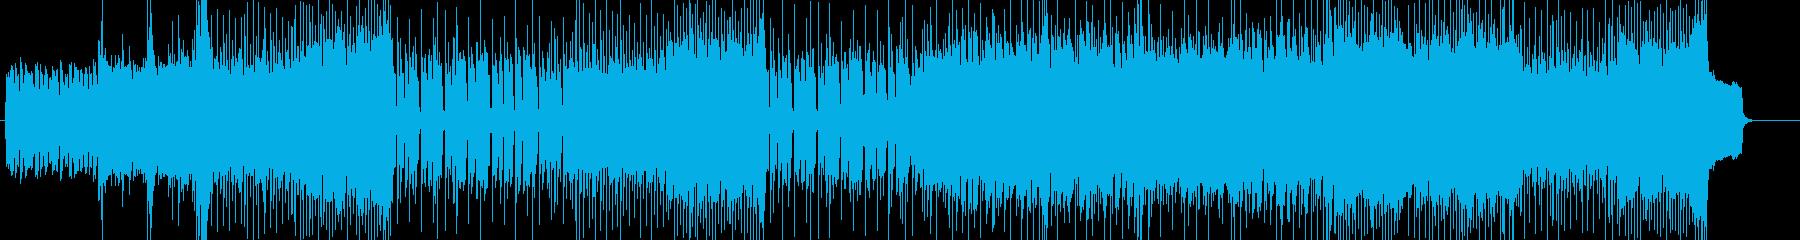 「HR/HM」「ROCK」BGM234の再生済みの波形